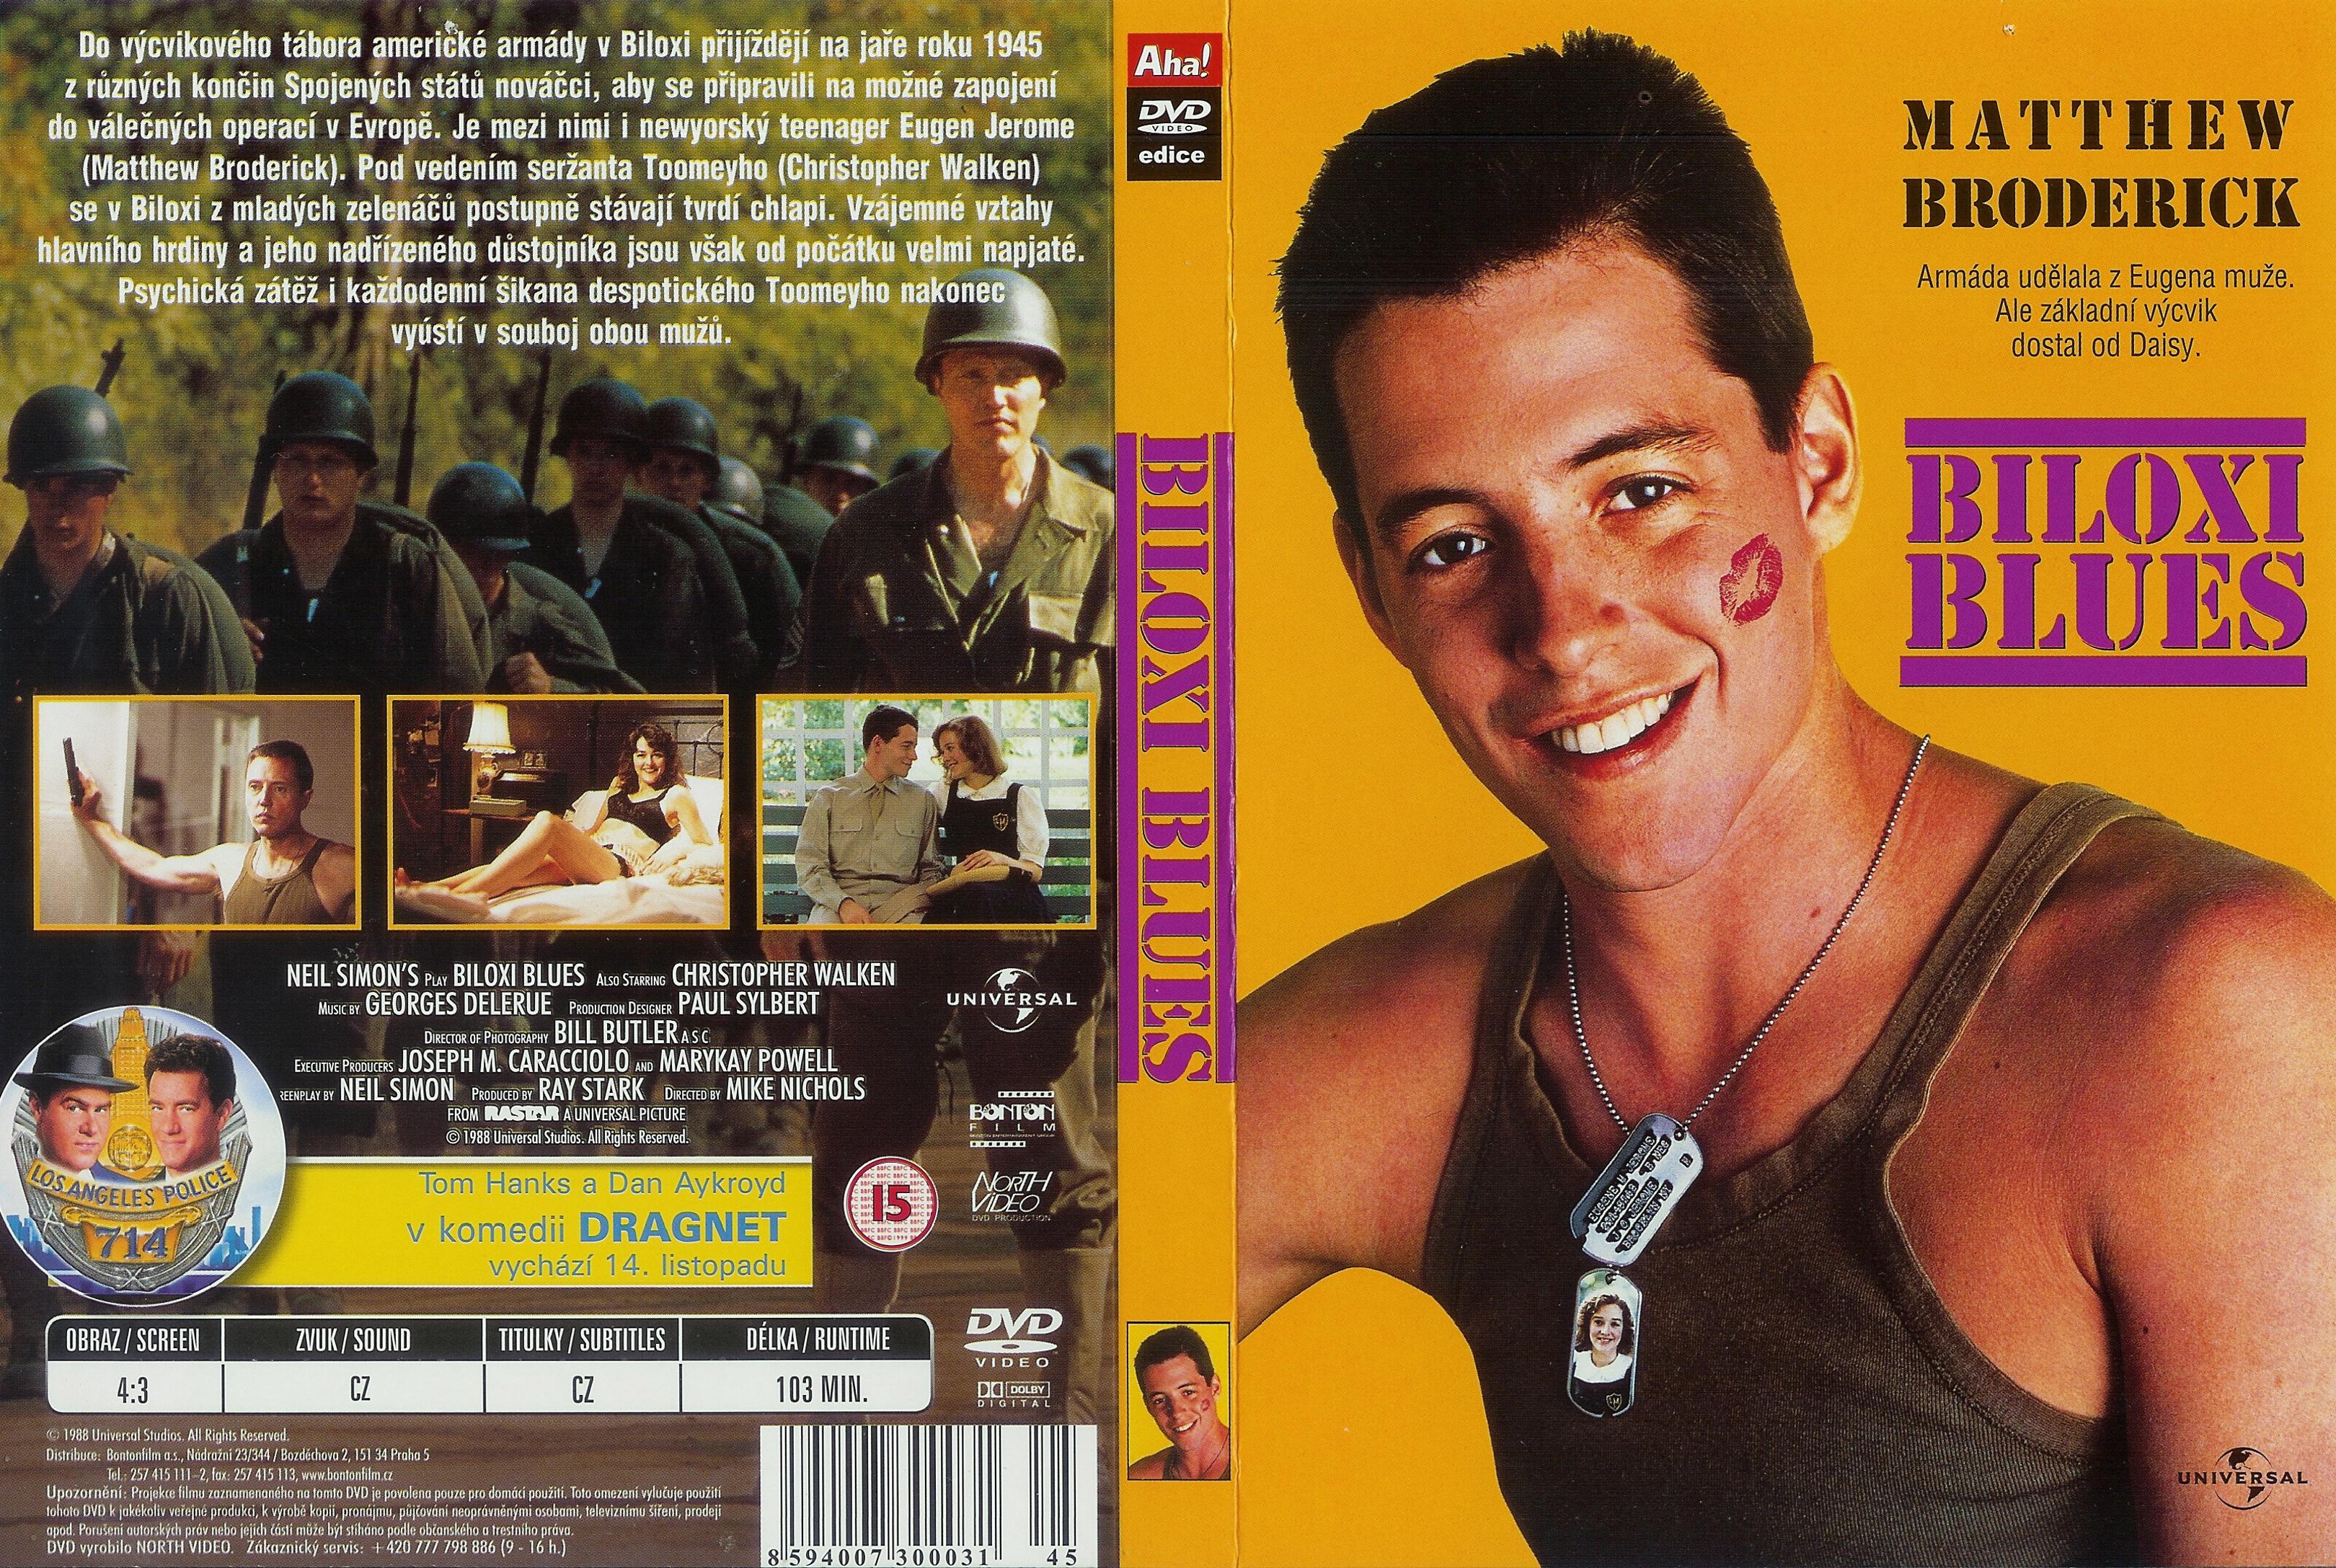 Covers Box Sk Biloxi Blues 1988 High Quality Dvd Blueray